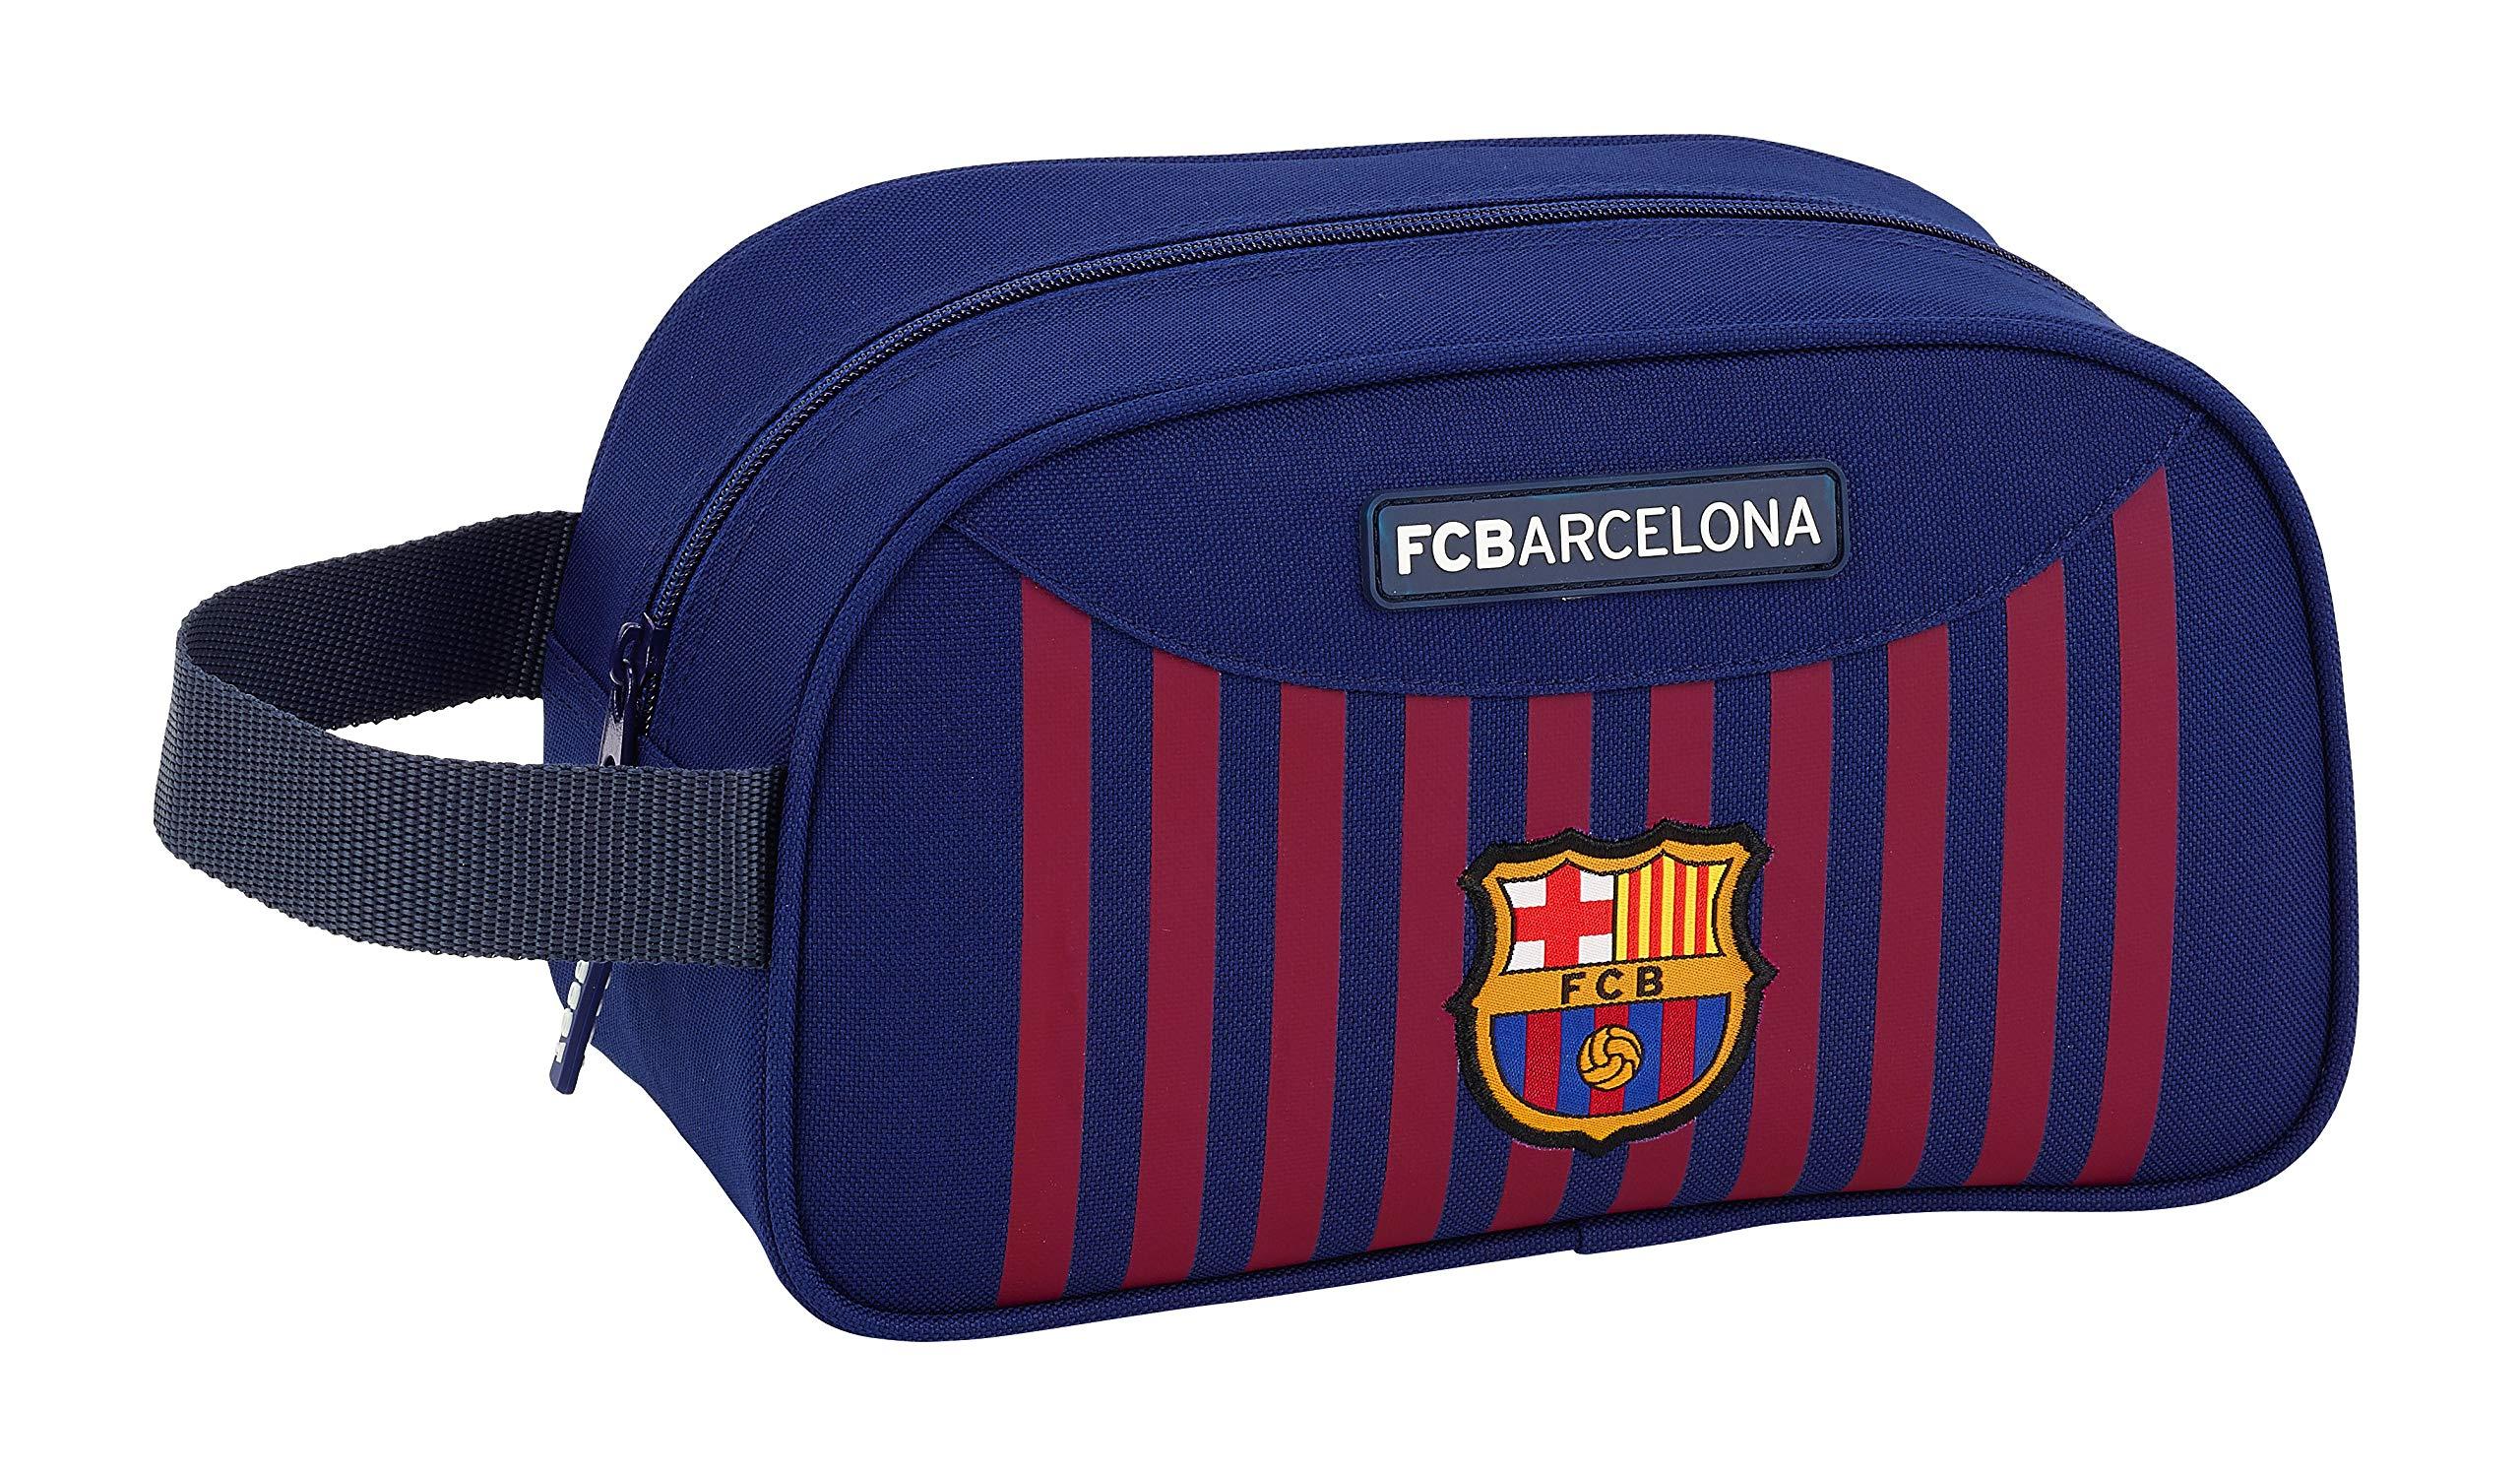 FC Barcelona 811829248 2018 Bolsa de Aseo 26 cm, Azul